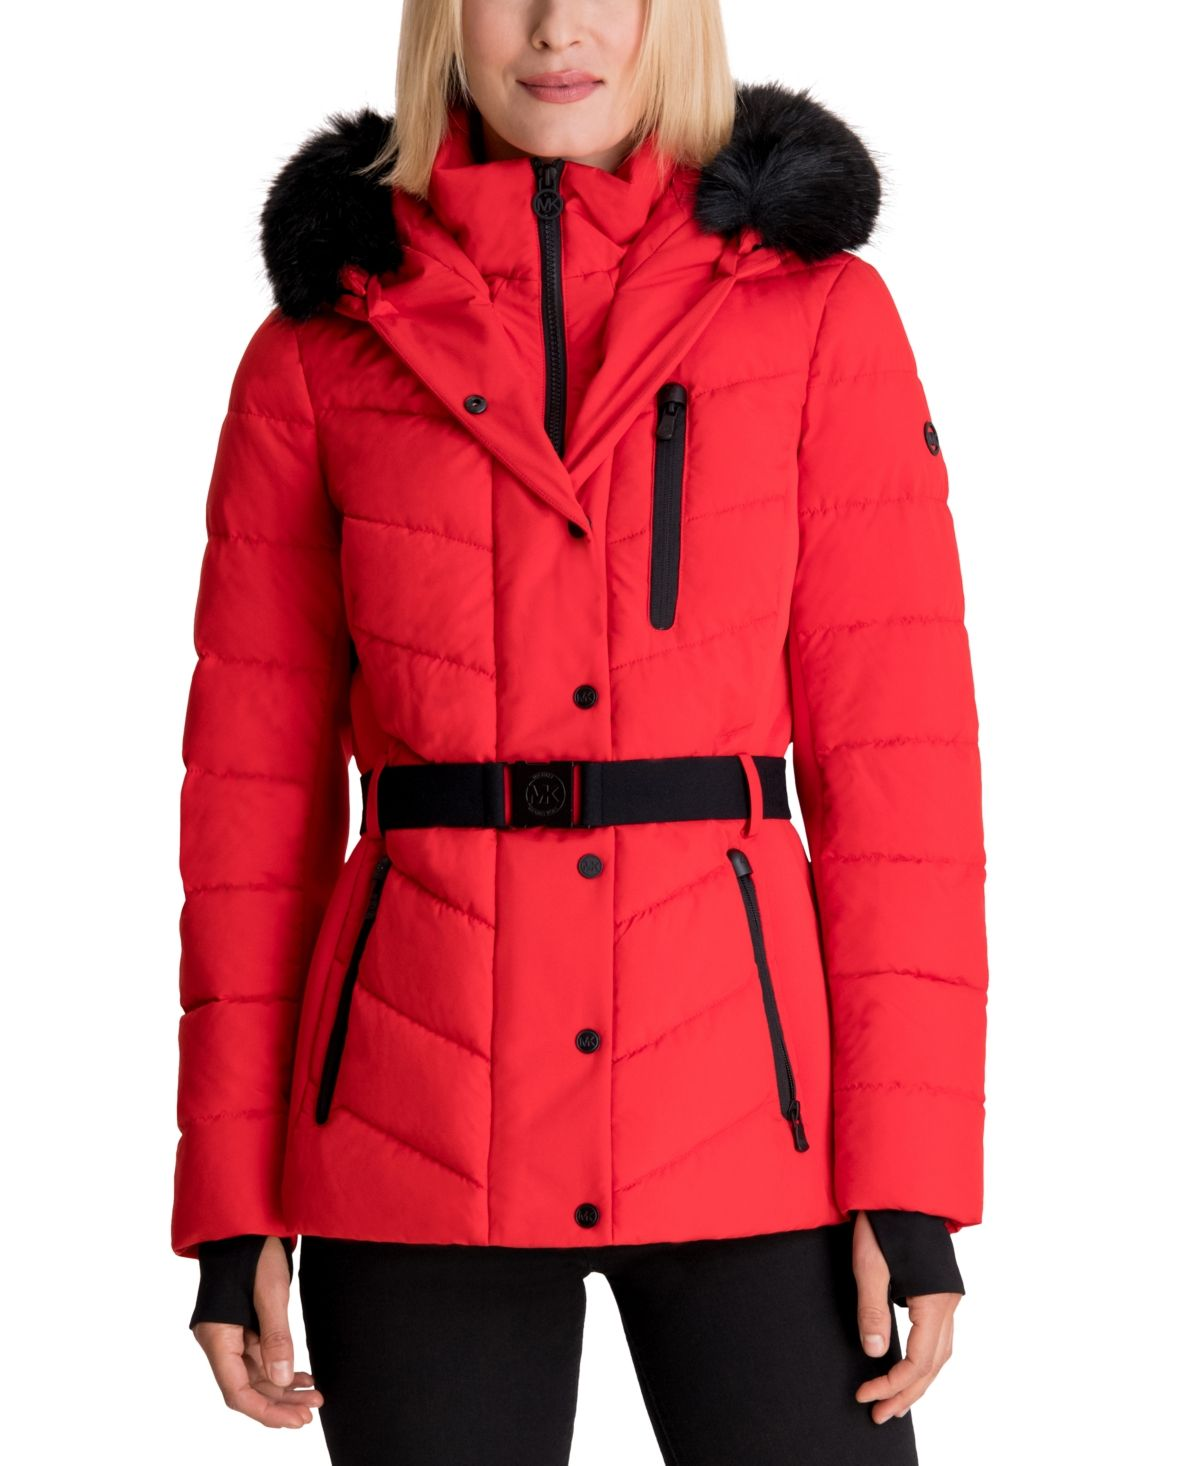 Michael Michael Kors Belted Faux Fur Trim Hooded Puffer Coat Red Puffer Coat Ski Coats For Women Womens Ski Coat [ 1466 x 1200 Pixel ]